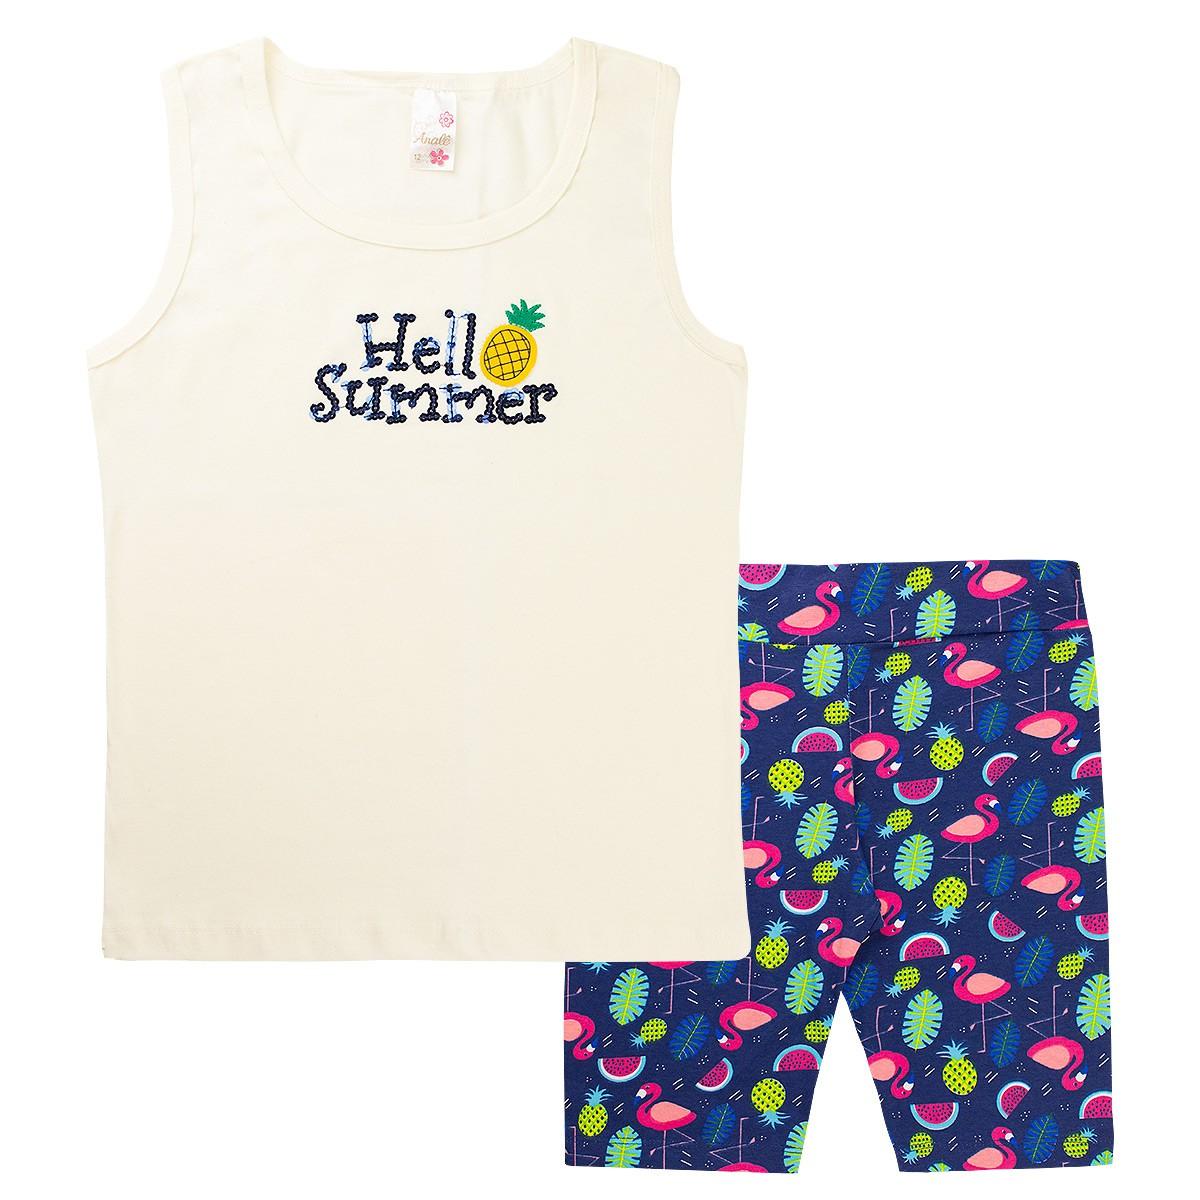 Kit 4 Conjuntos Infantis Femininos Verão Regata